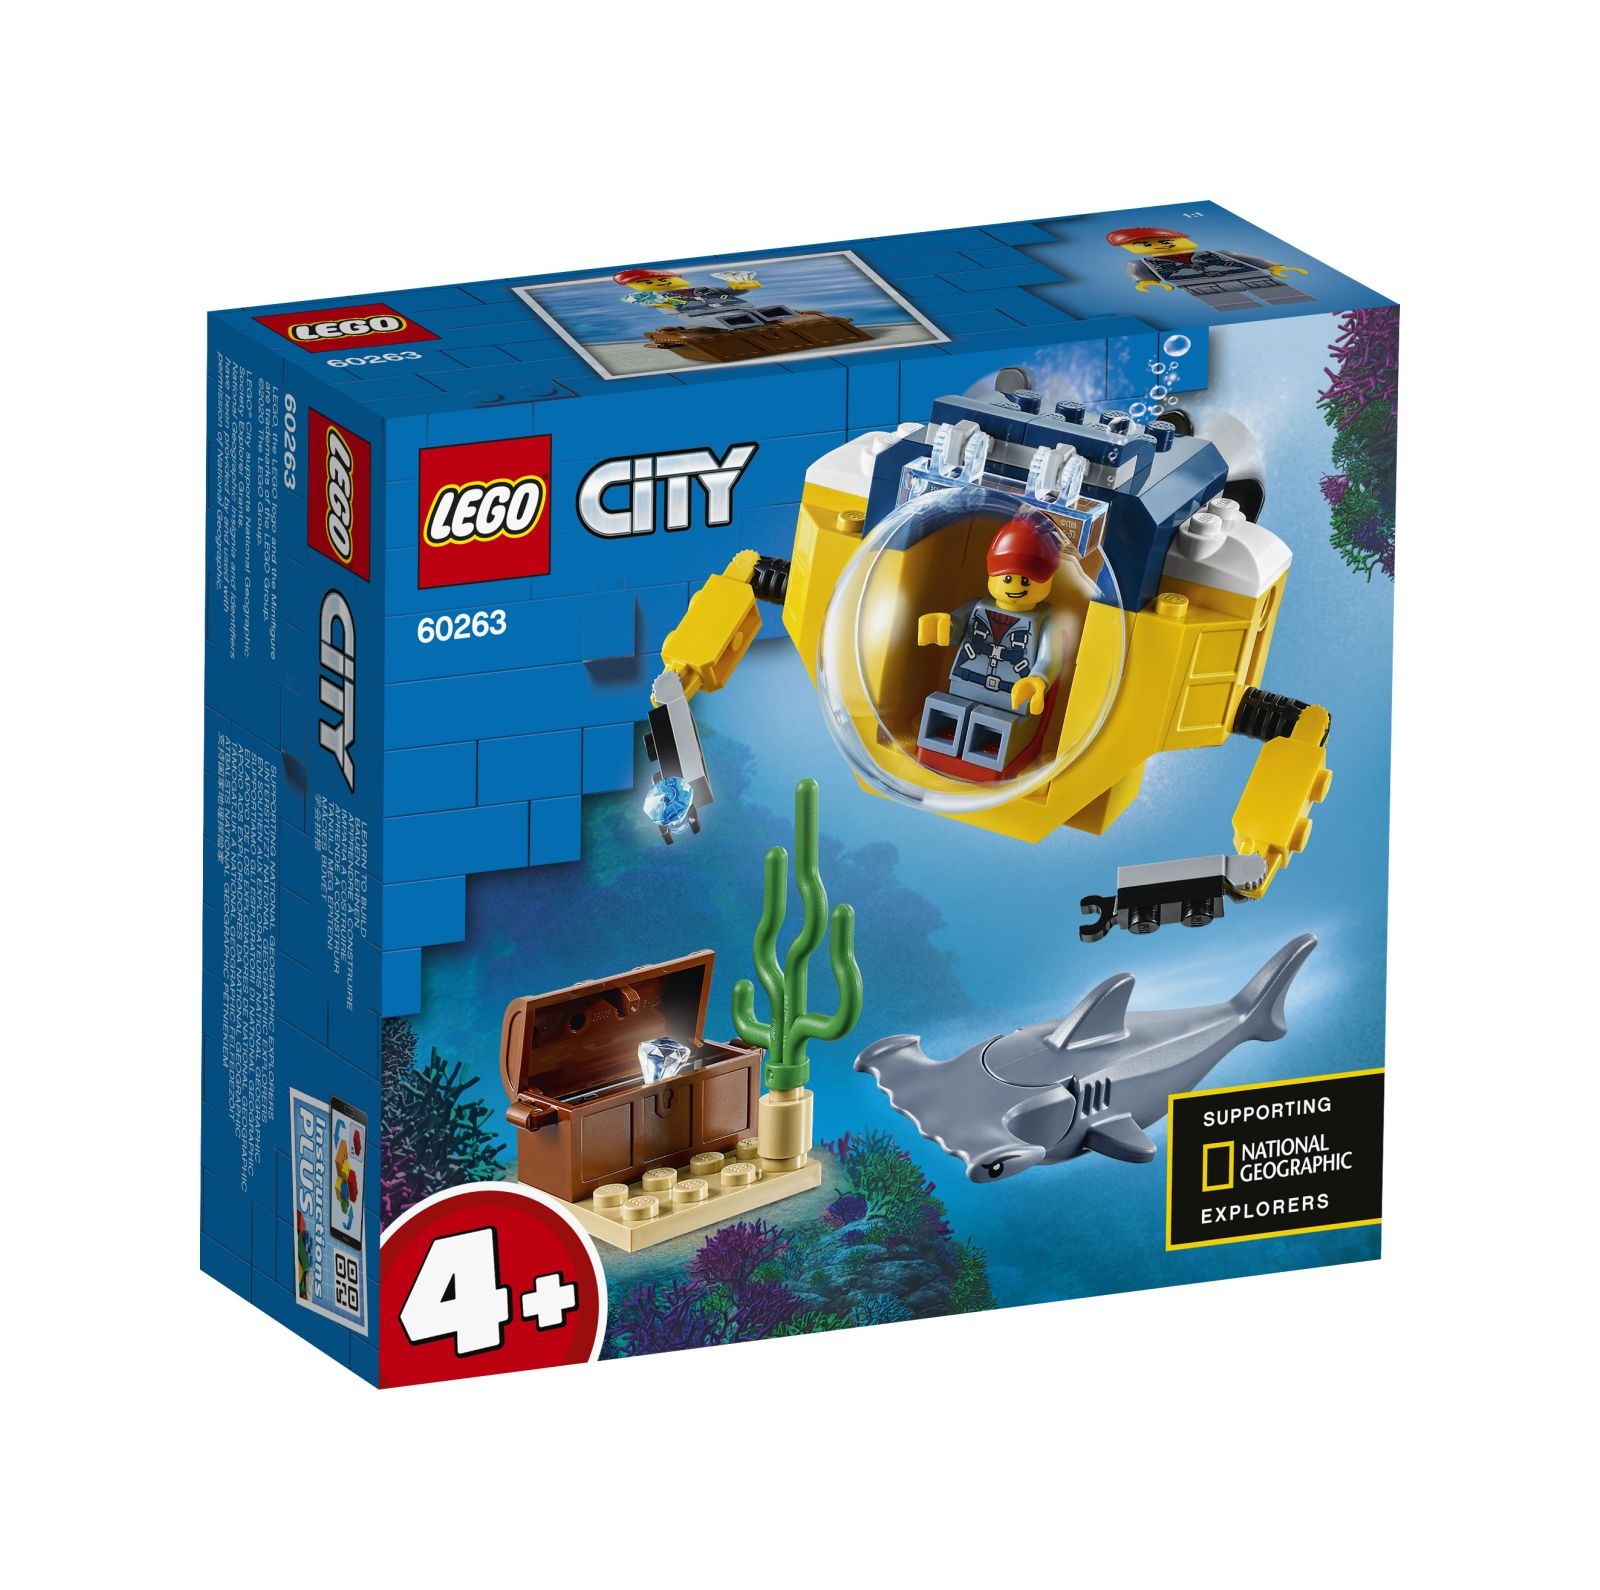 Lego city minisottomarino oceanico - 60263 - LEGO CITY